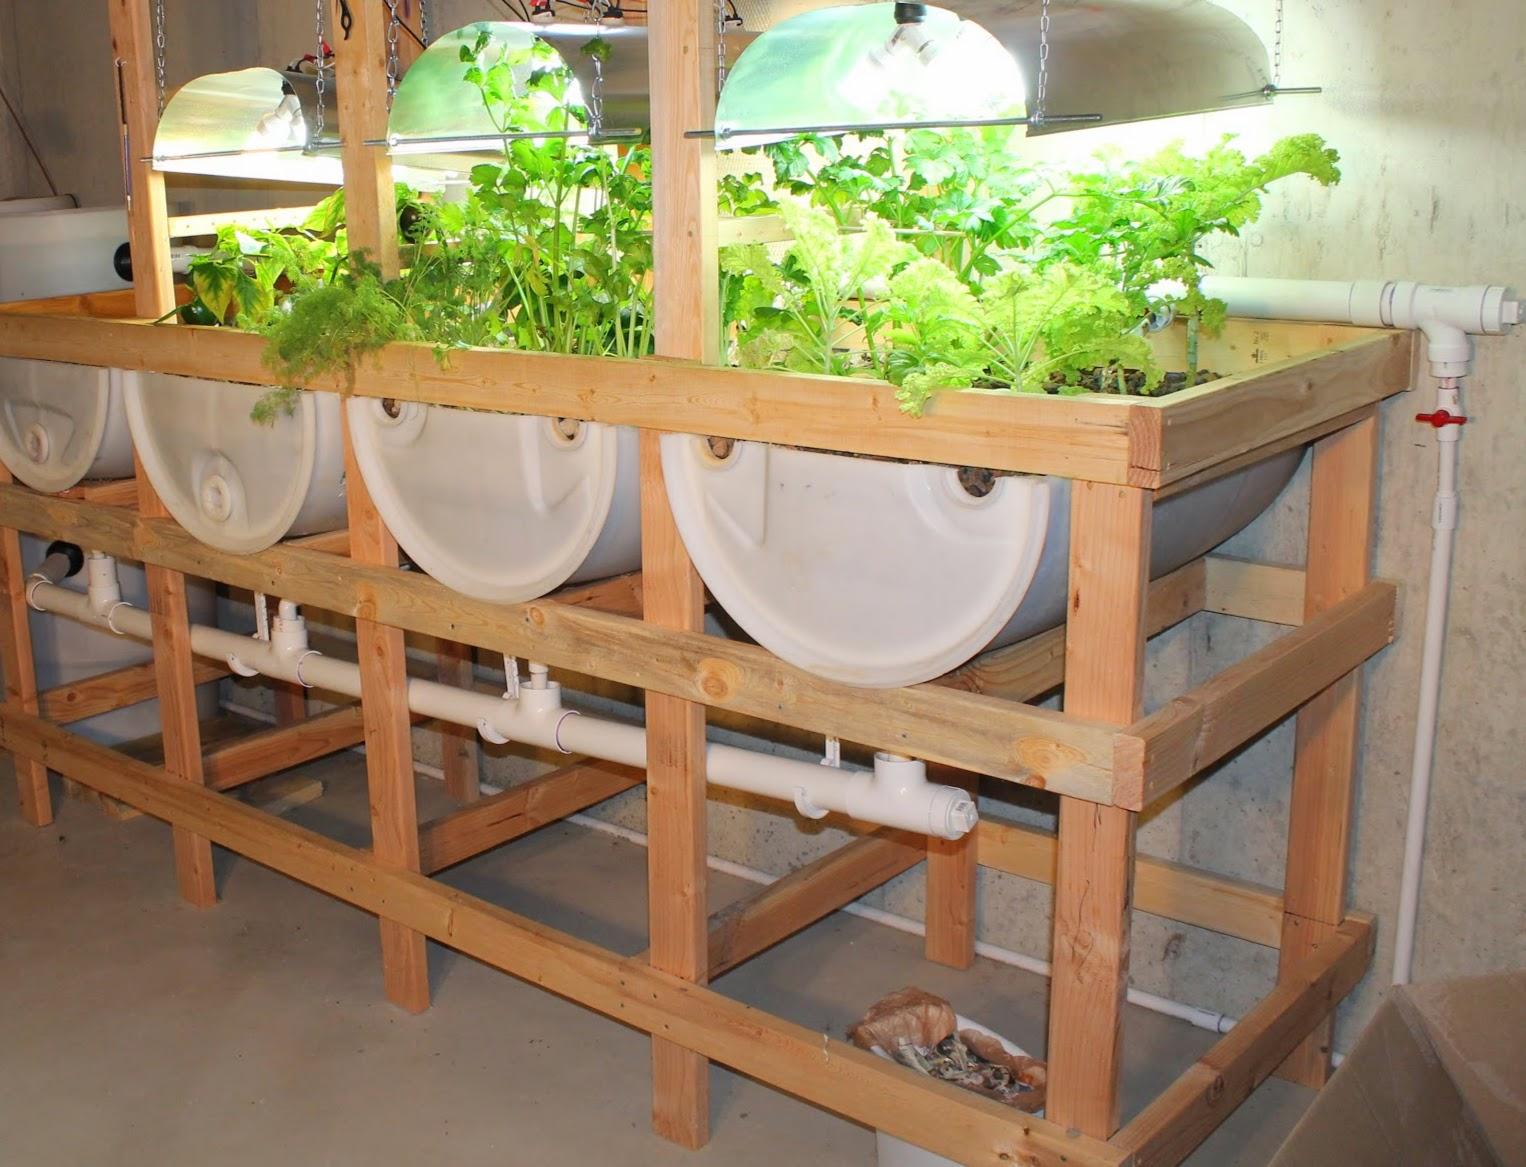 Suburban Aquaponics Benefits Of Indoor And Outdoor